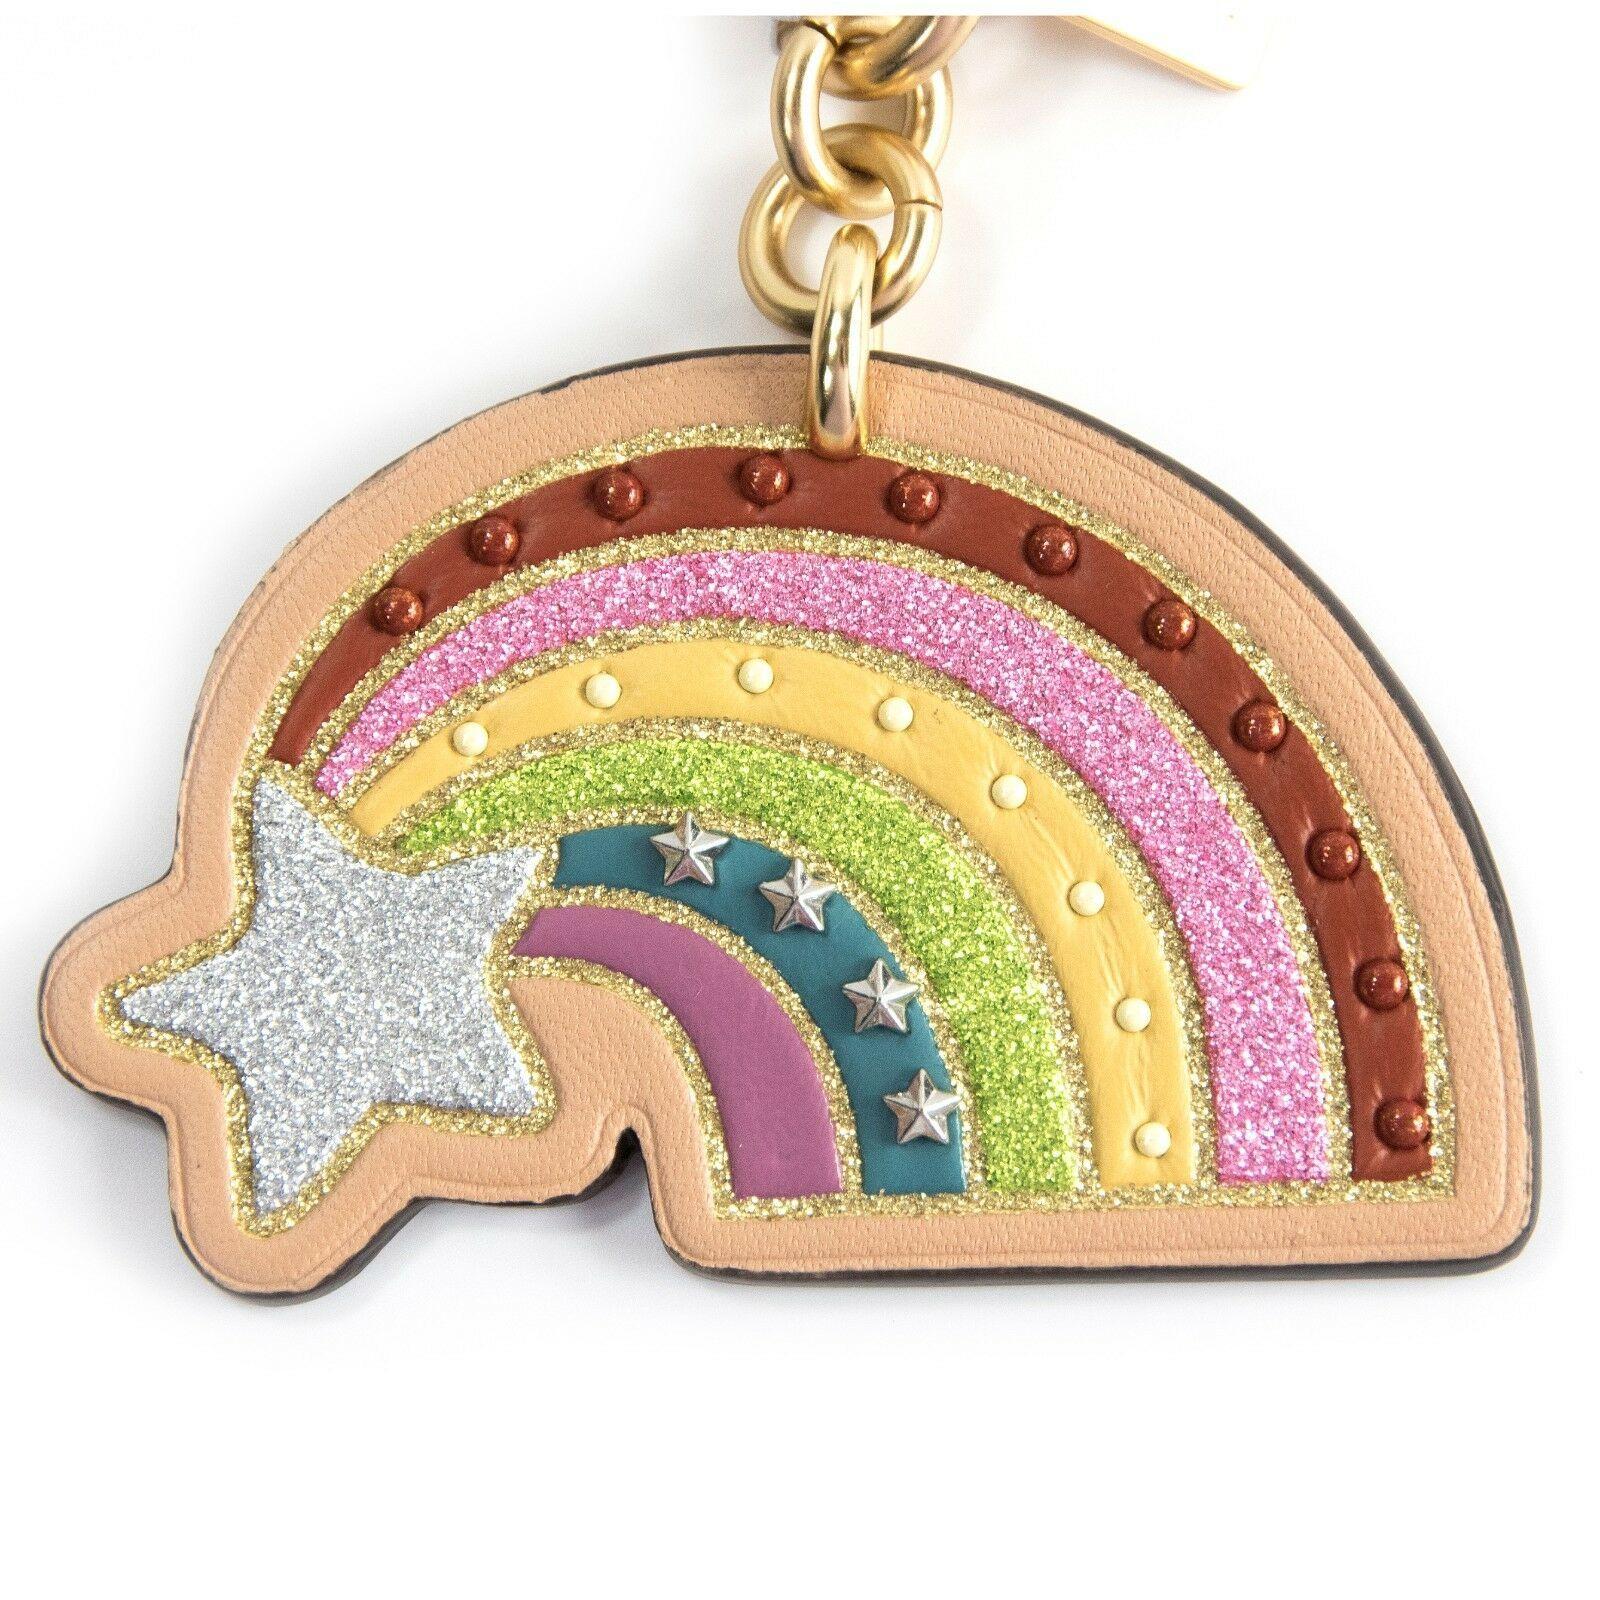 Coach NASA Shooting Star Rainbow Studded Leather Bag Charm Key Chain 27651 NWT image 2